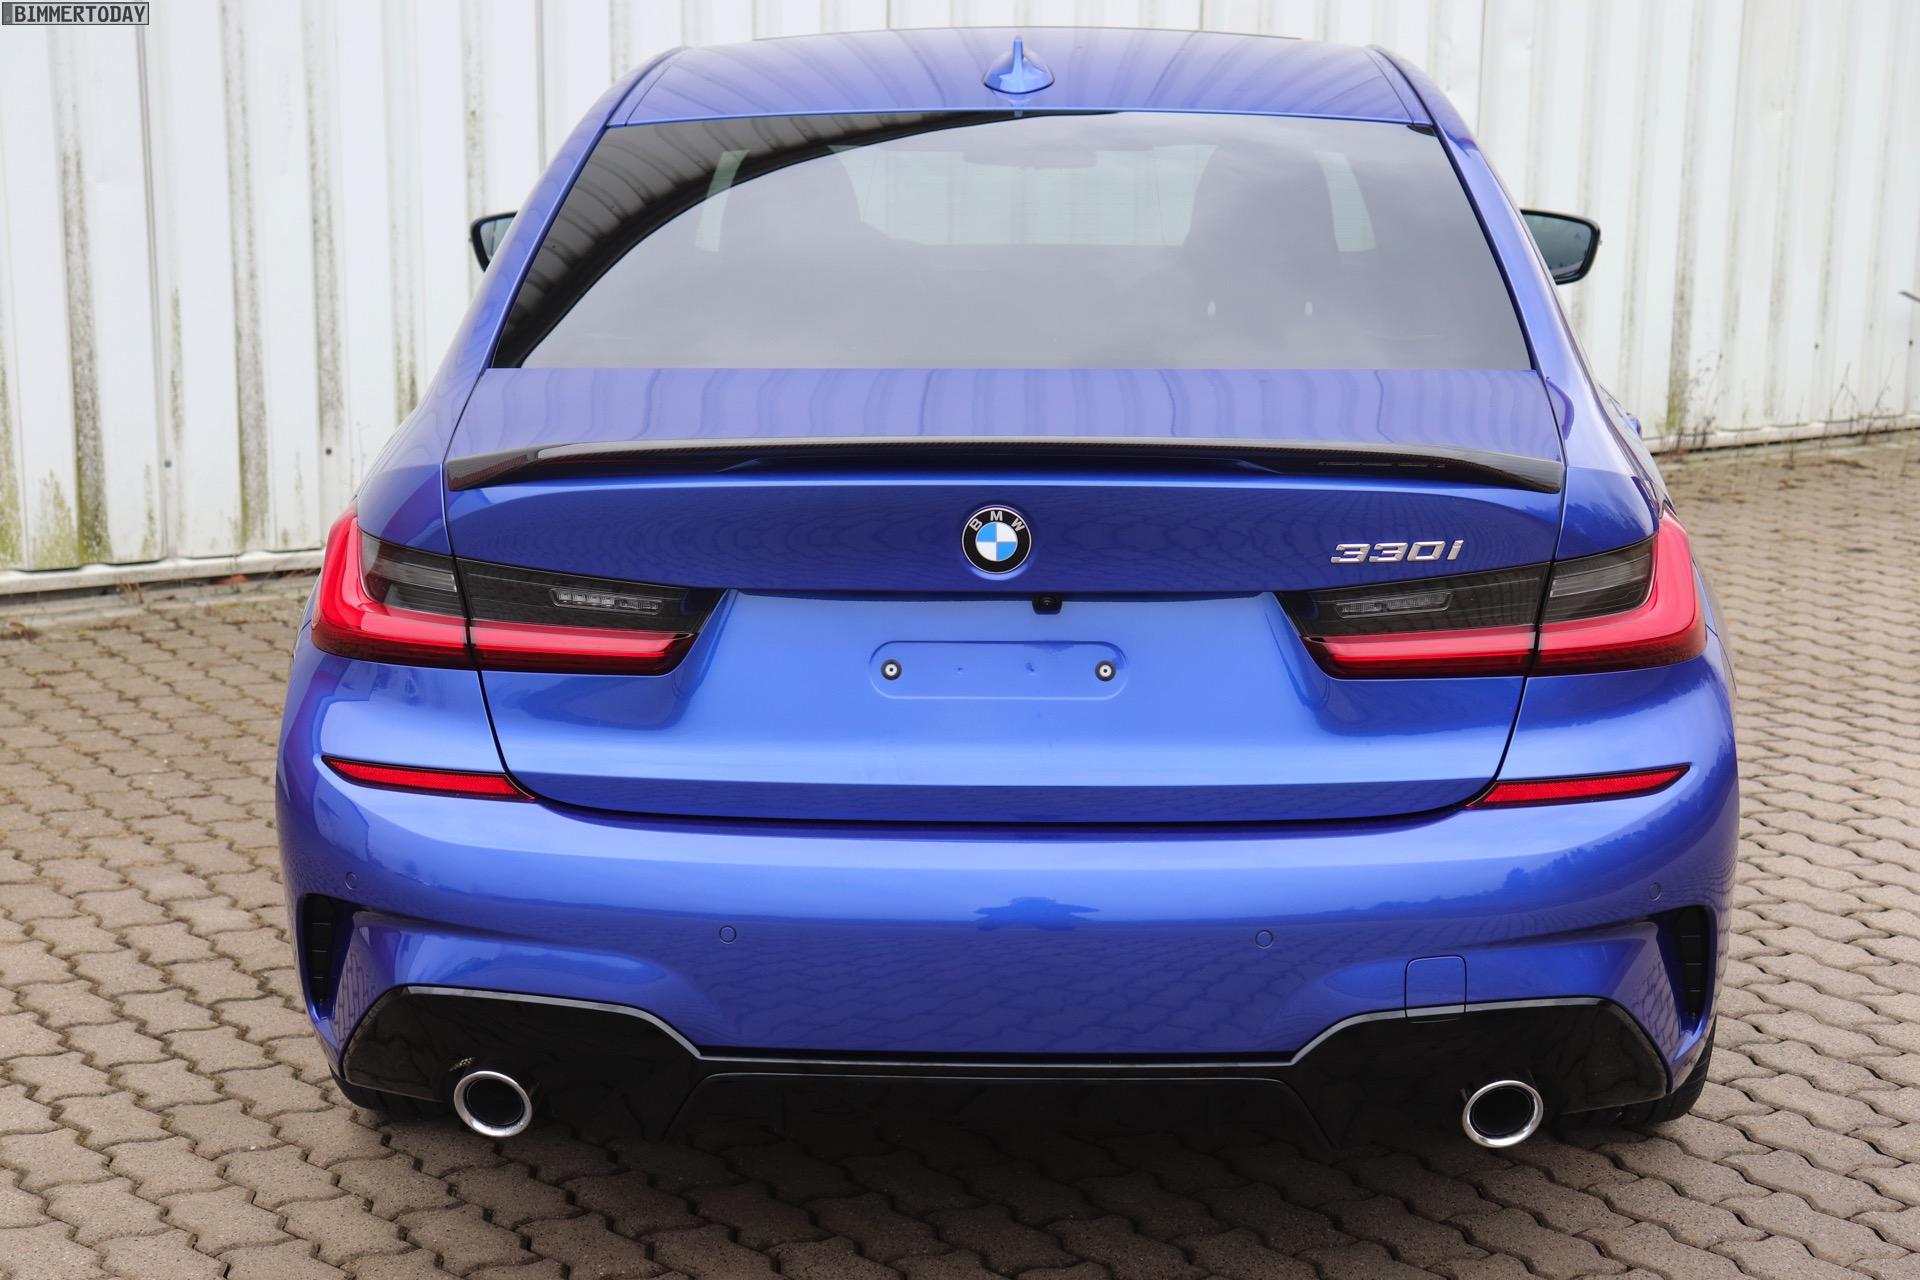 Name:  2019-BMW-330i-G20-M-Performance-Parts-1.jpg2019-BMW-330i-G20-M-Performance-Parts-1.jpg2019-BMW-3.jpg Views: 4483 Size:  455.8 KB